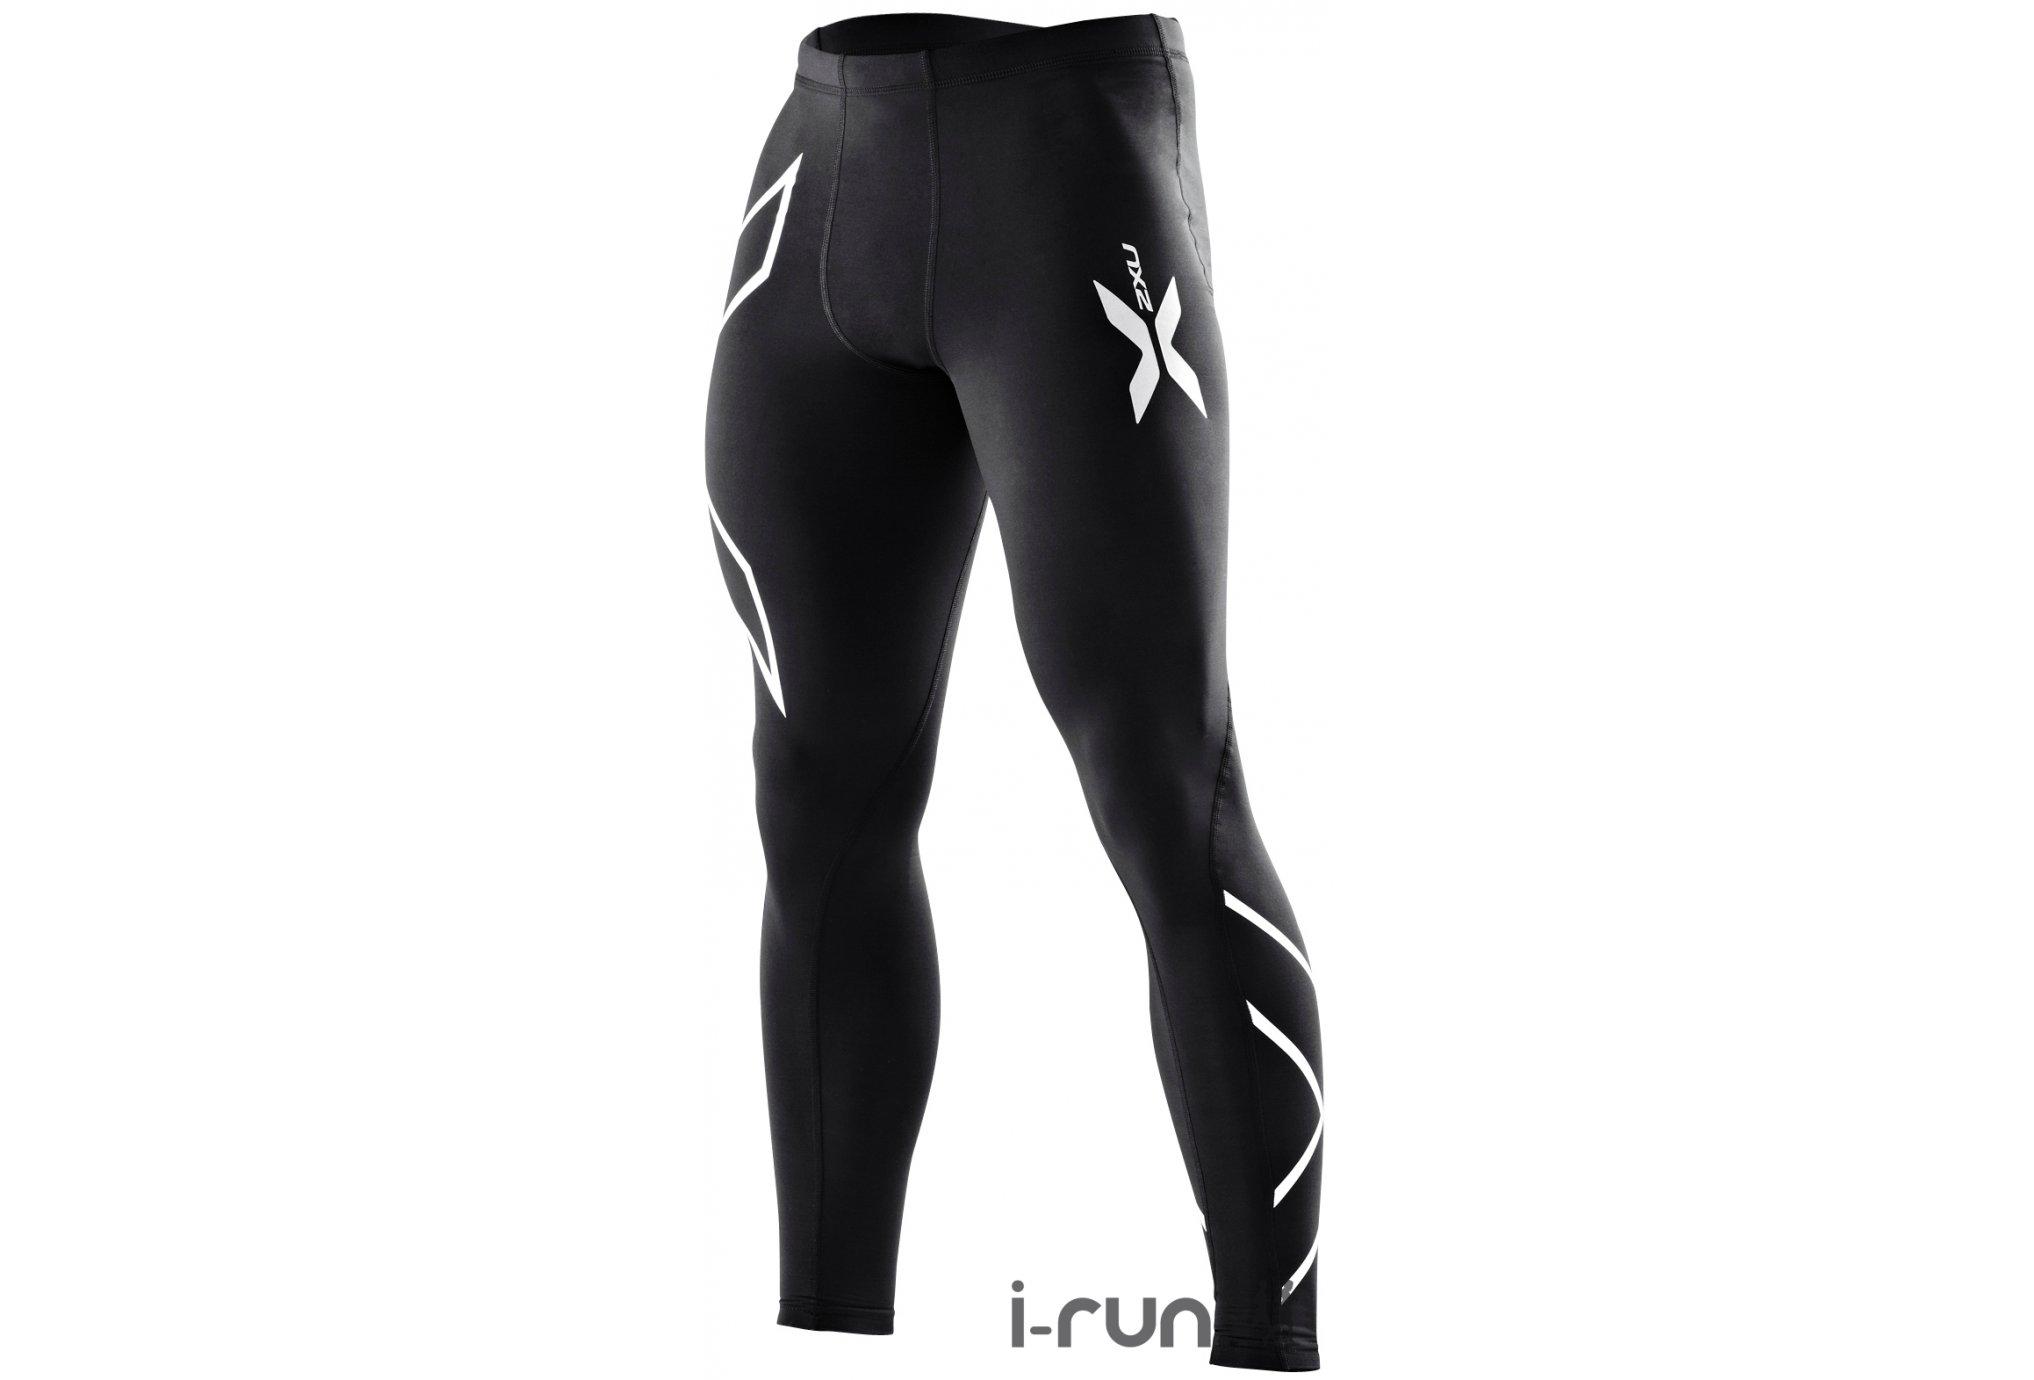 2xu Collant xform compression m vêtement running homme